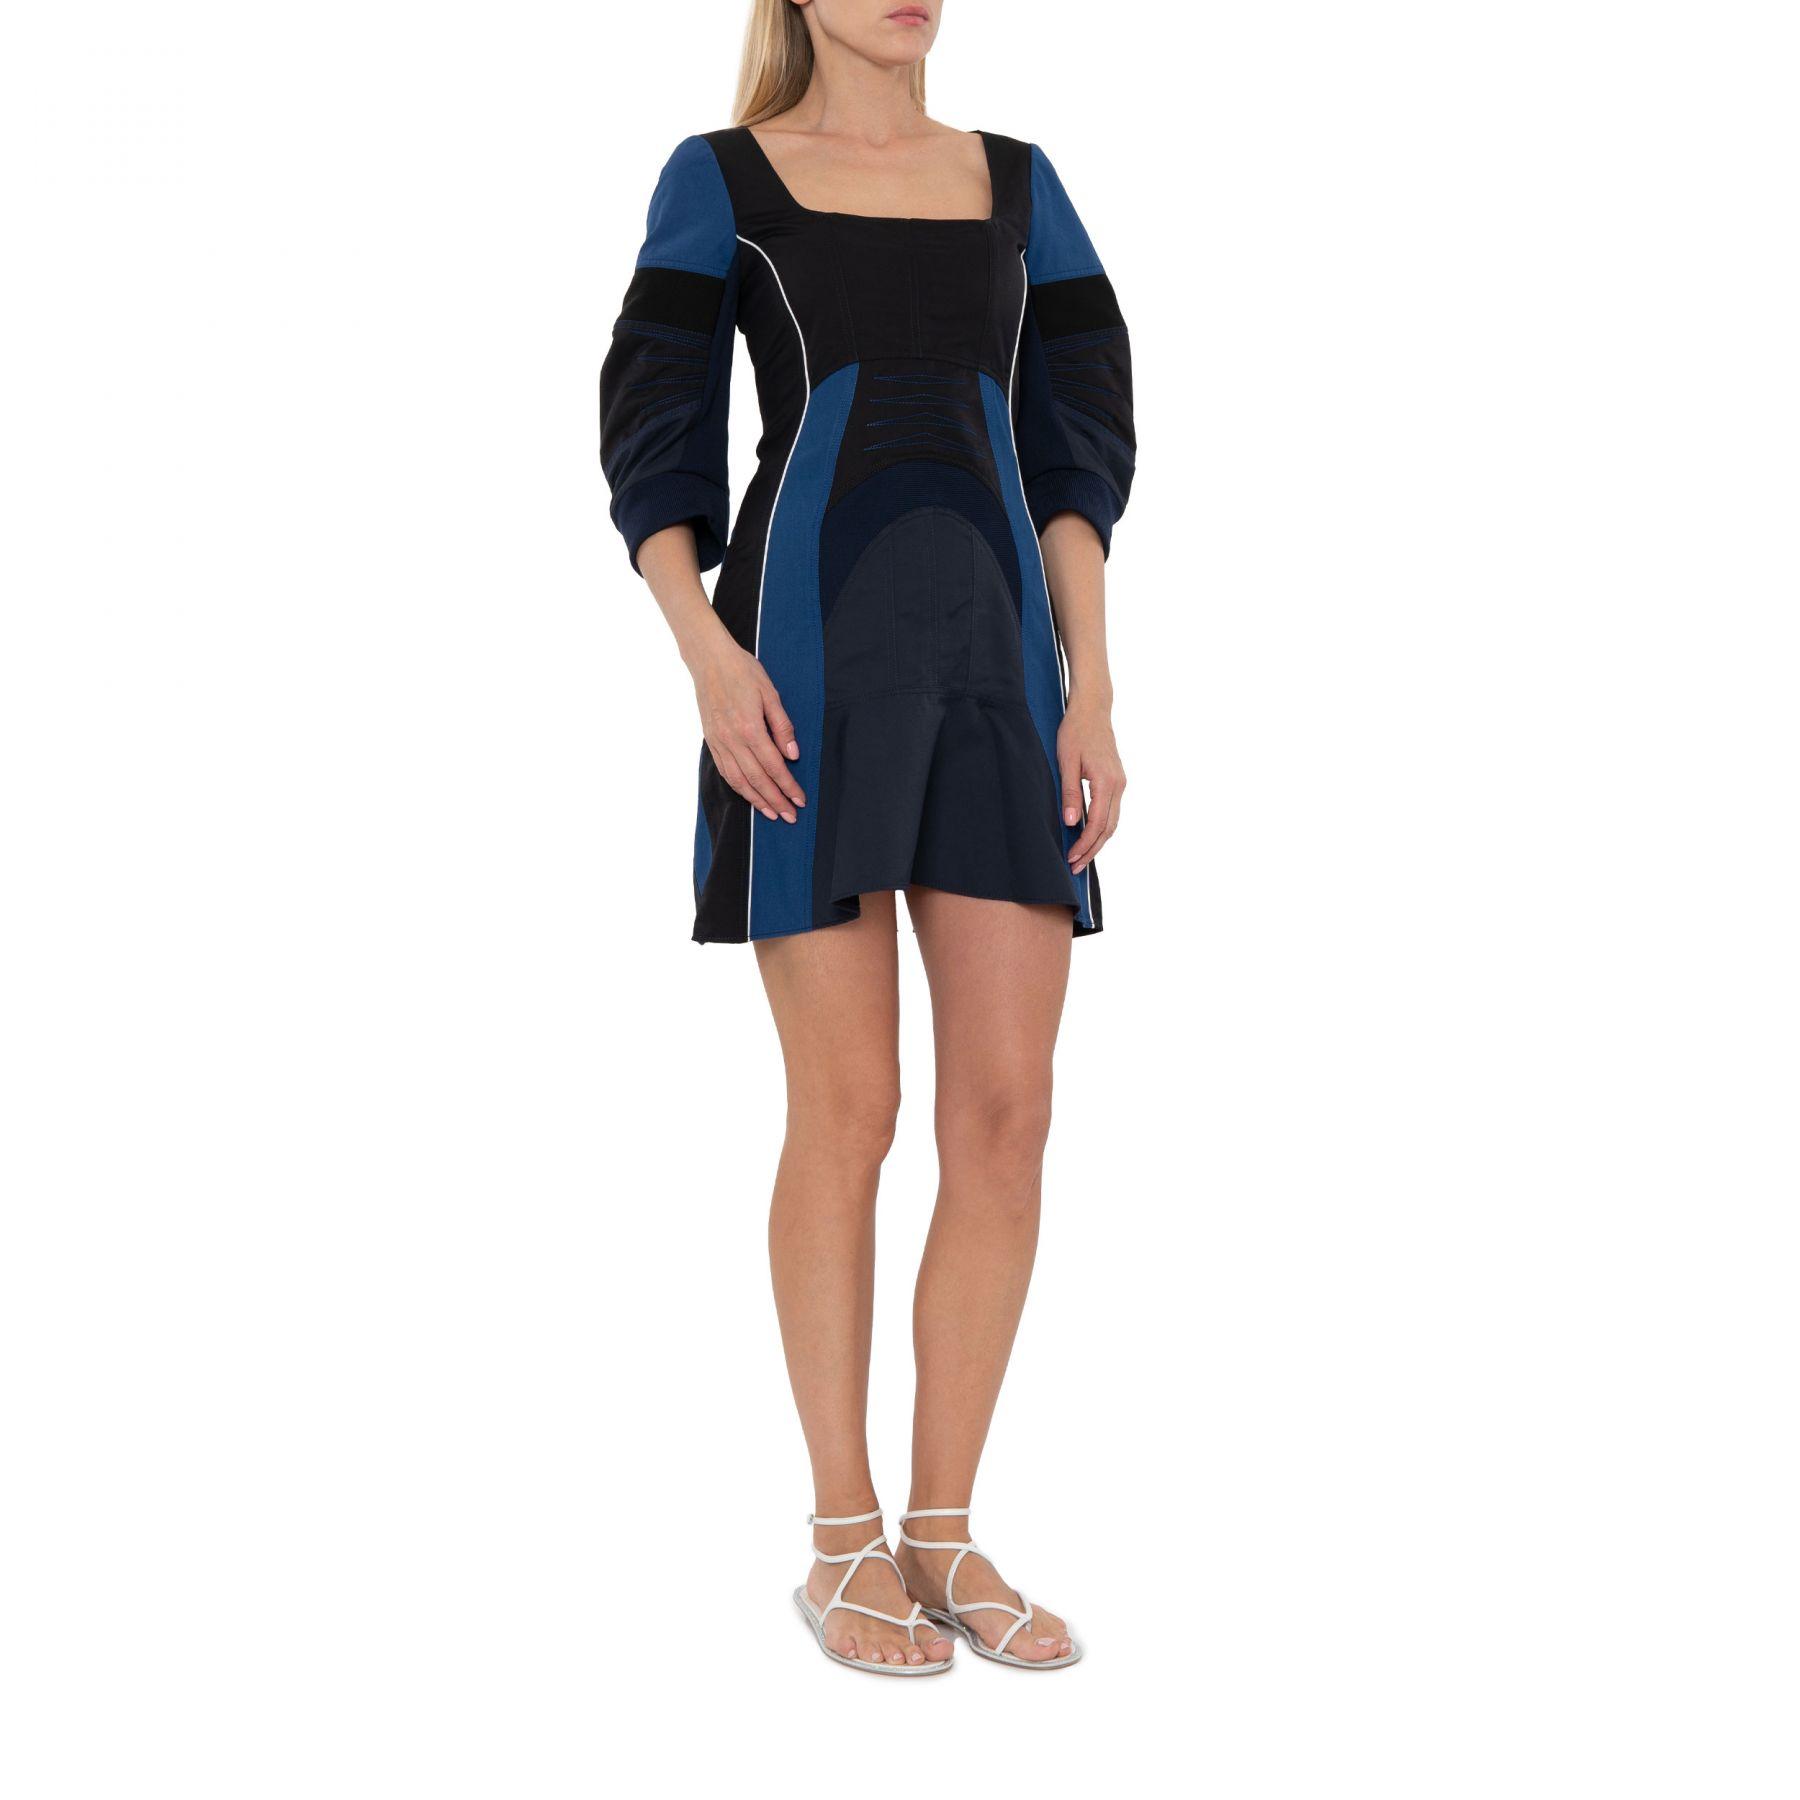 Платье Stella McCartney Giselle черно-синее